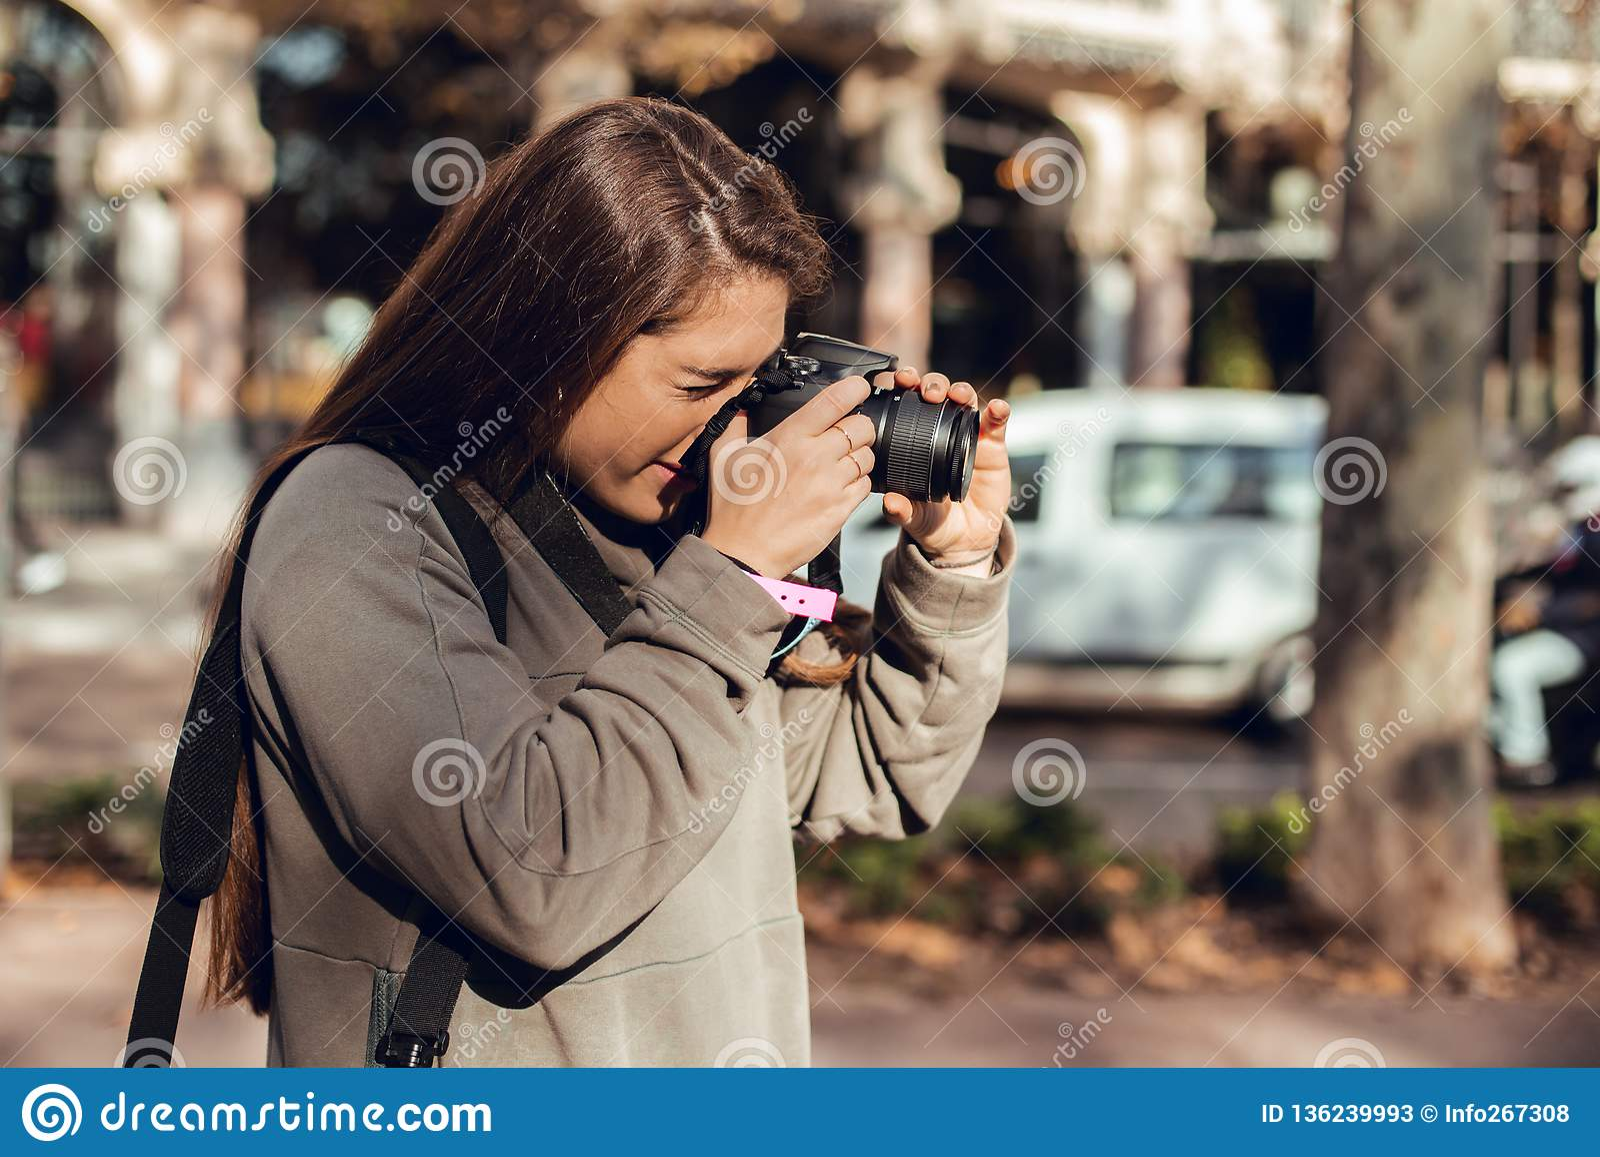 Portrait of brunette girl taking pictures